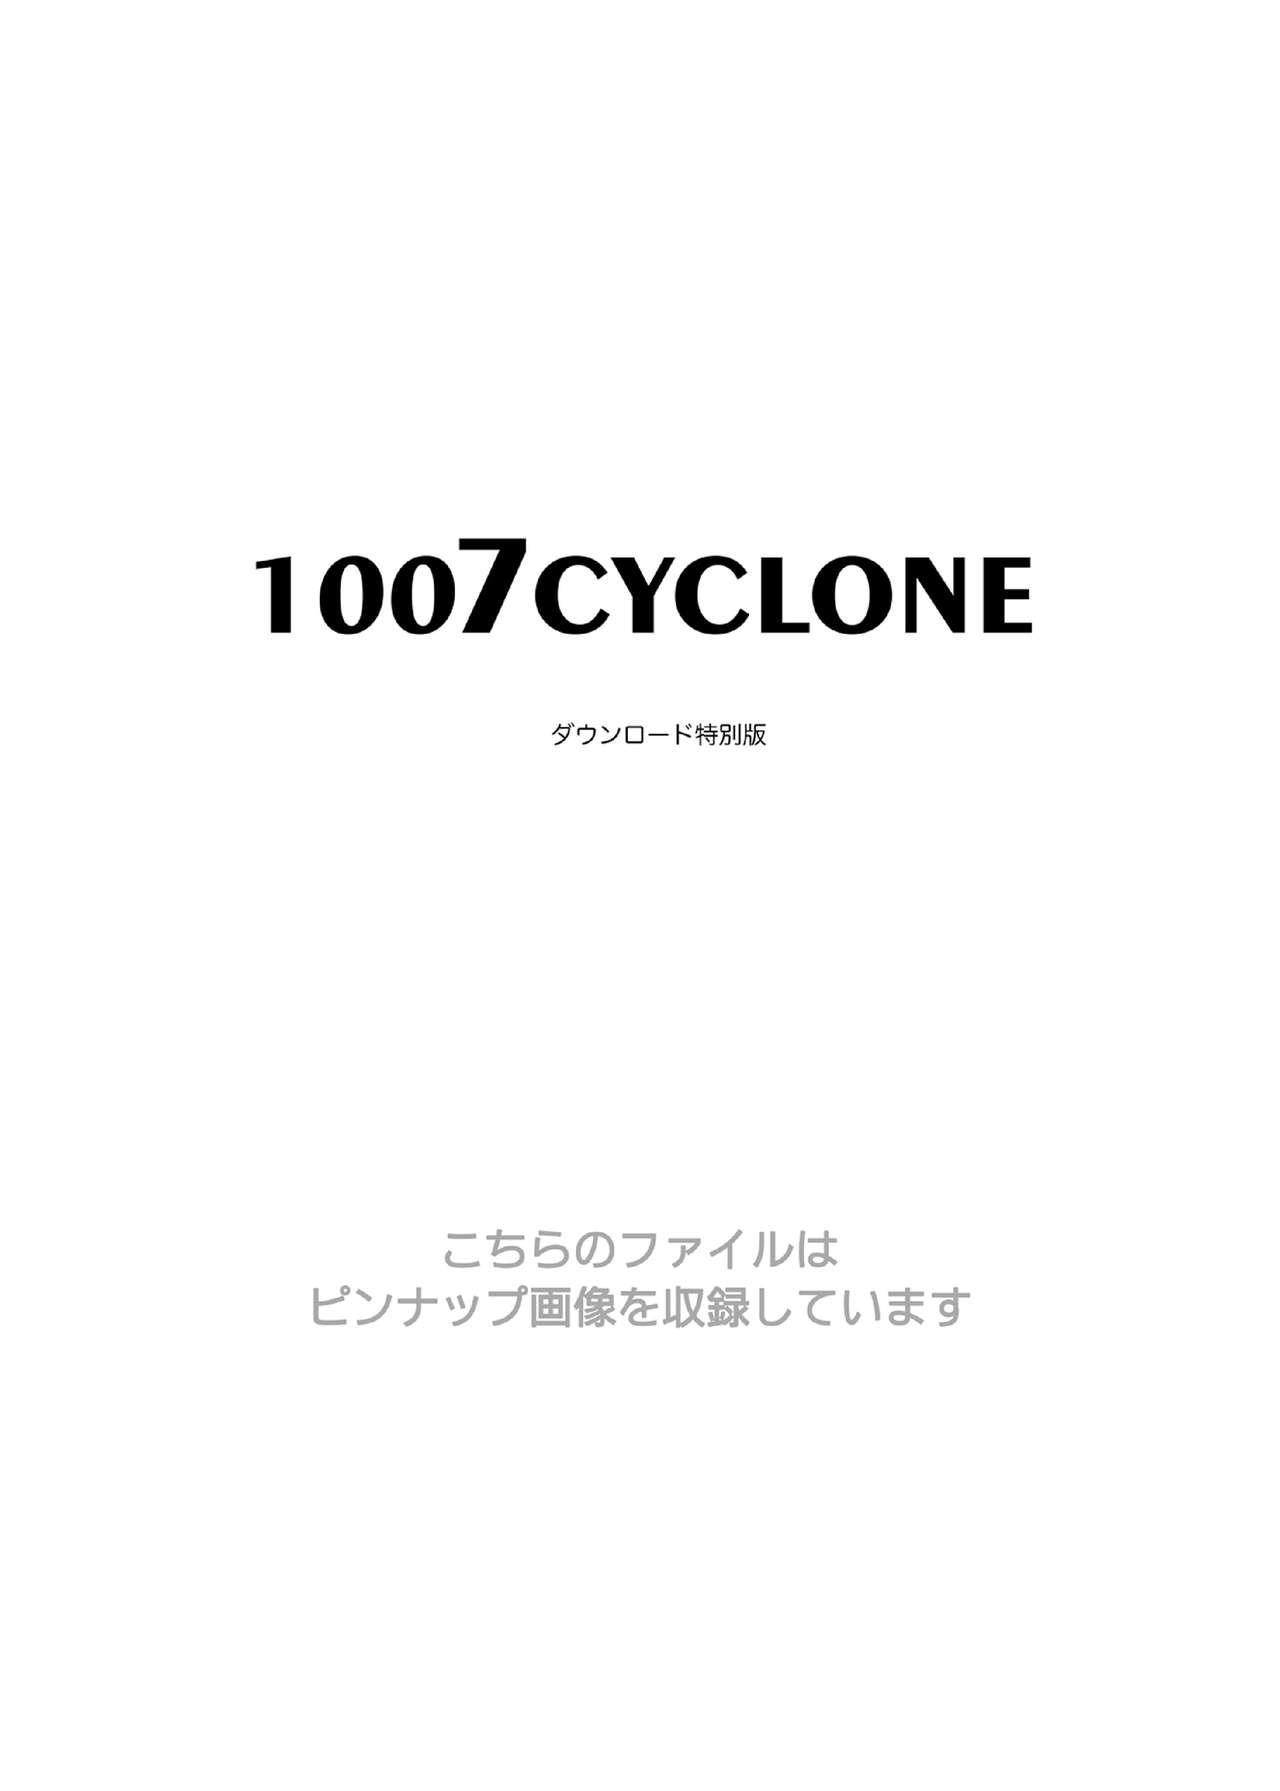 1007CYCLONE 170